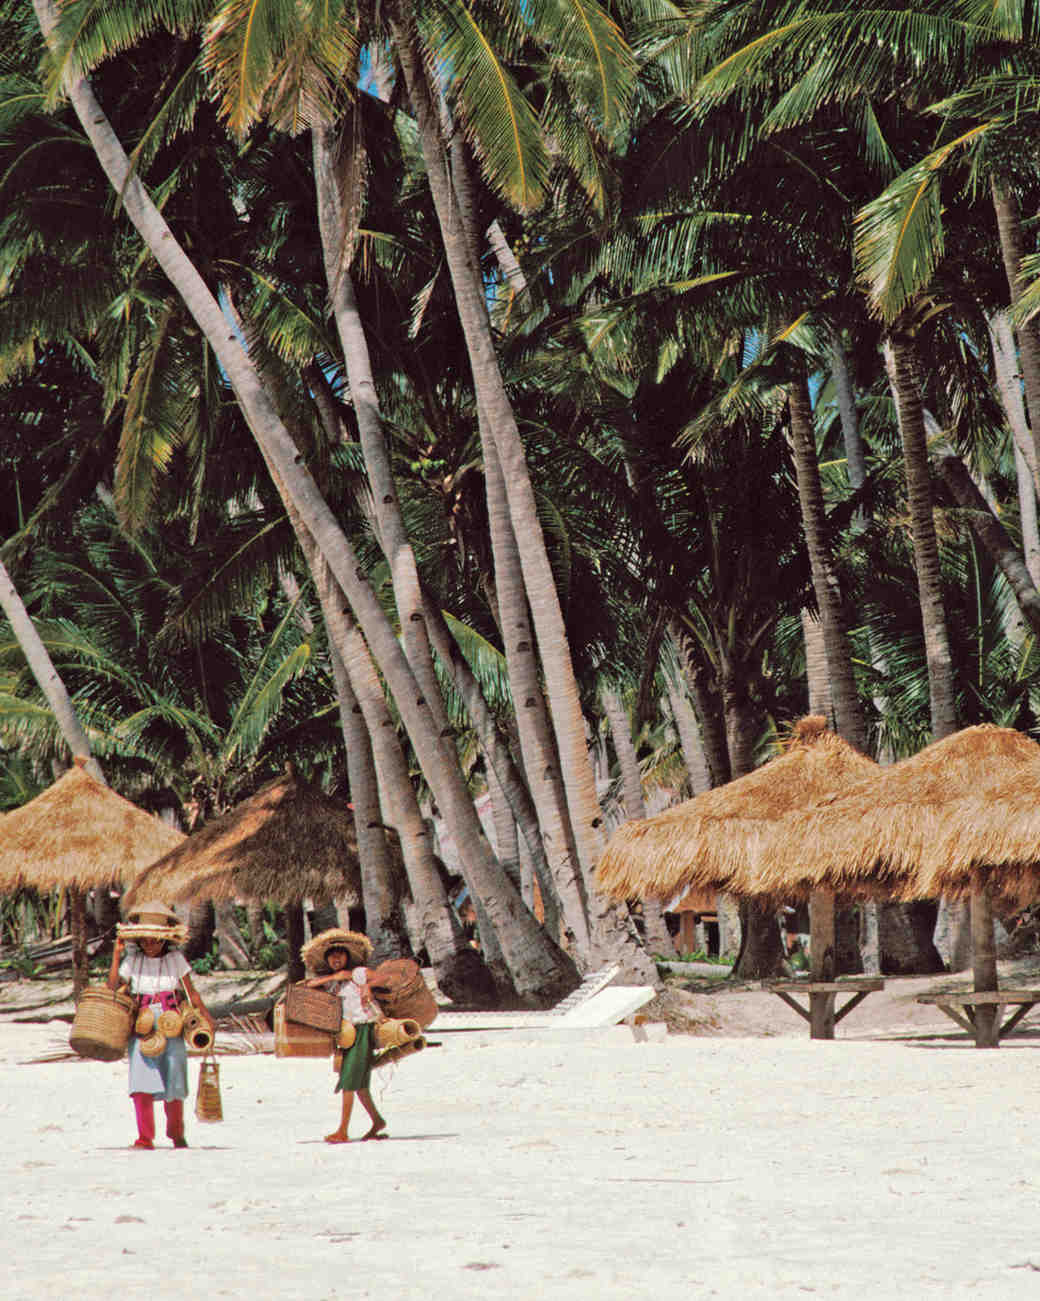 philippines-beach-mwds108353.jpg